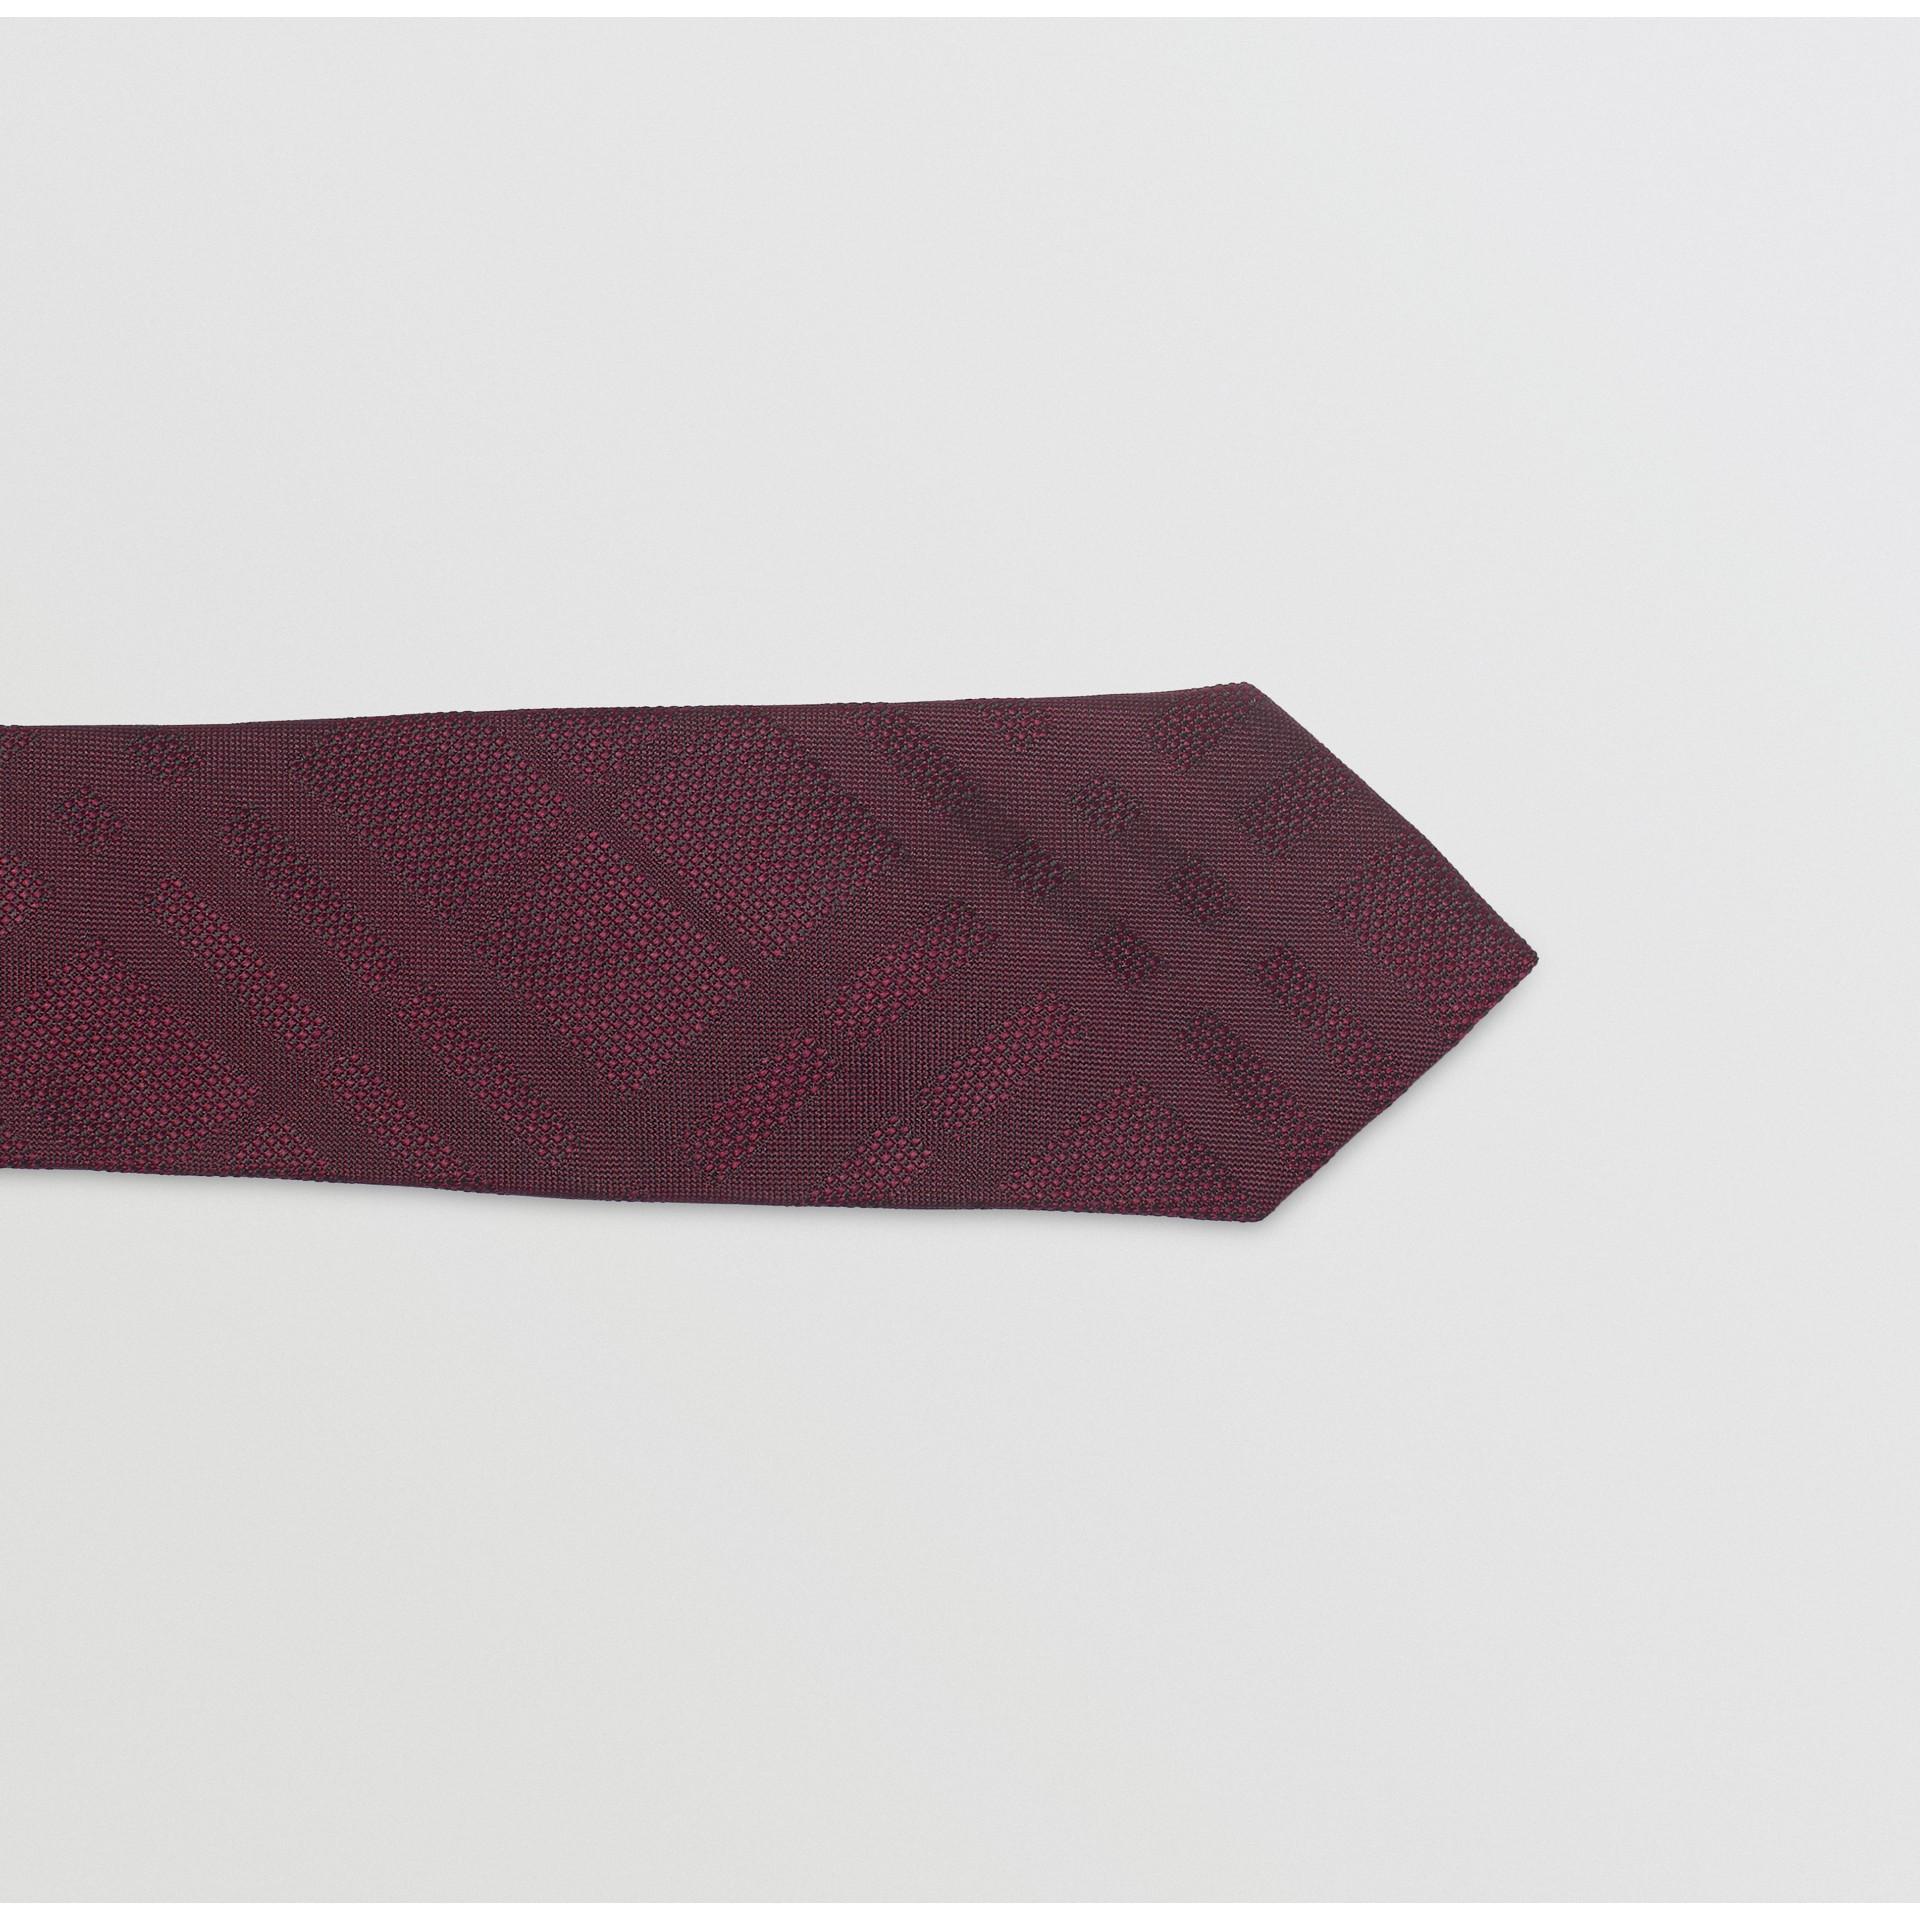 Modern Cut Check Silk Tie in Deep Claret - Men | Burberry - gallery image 1